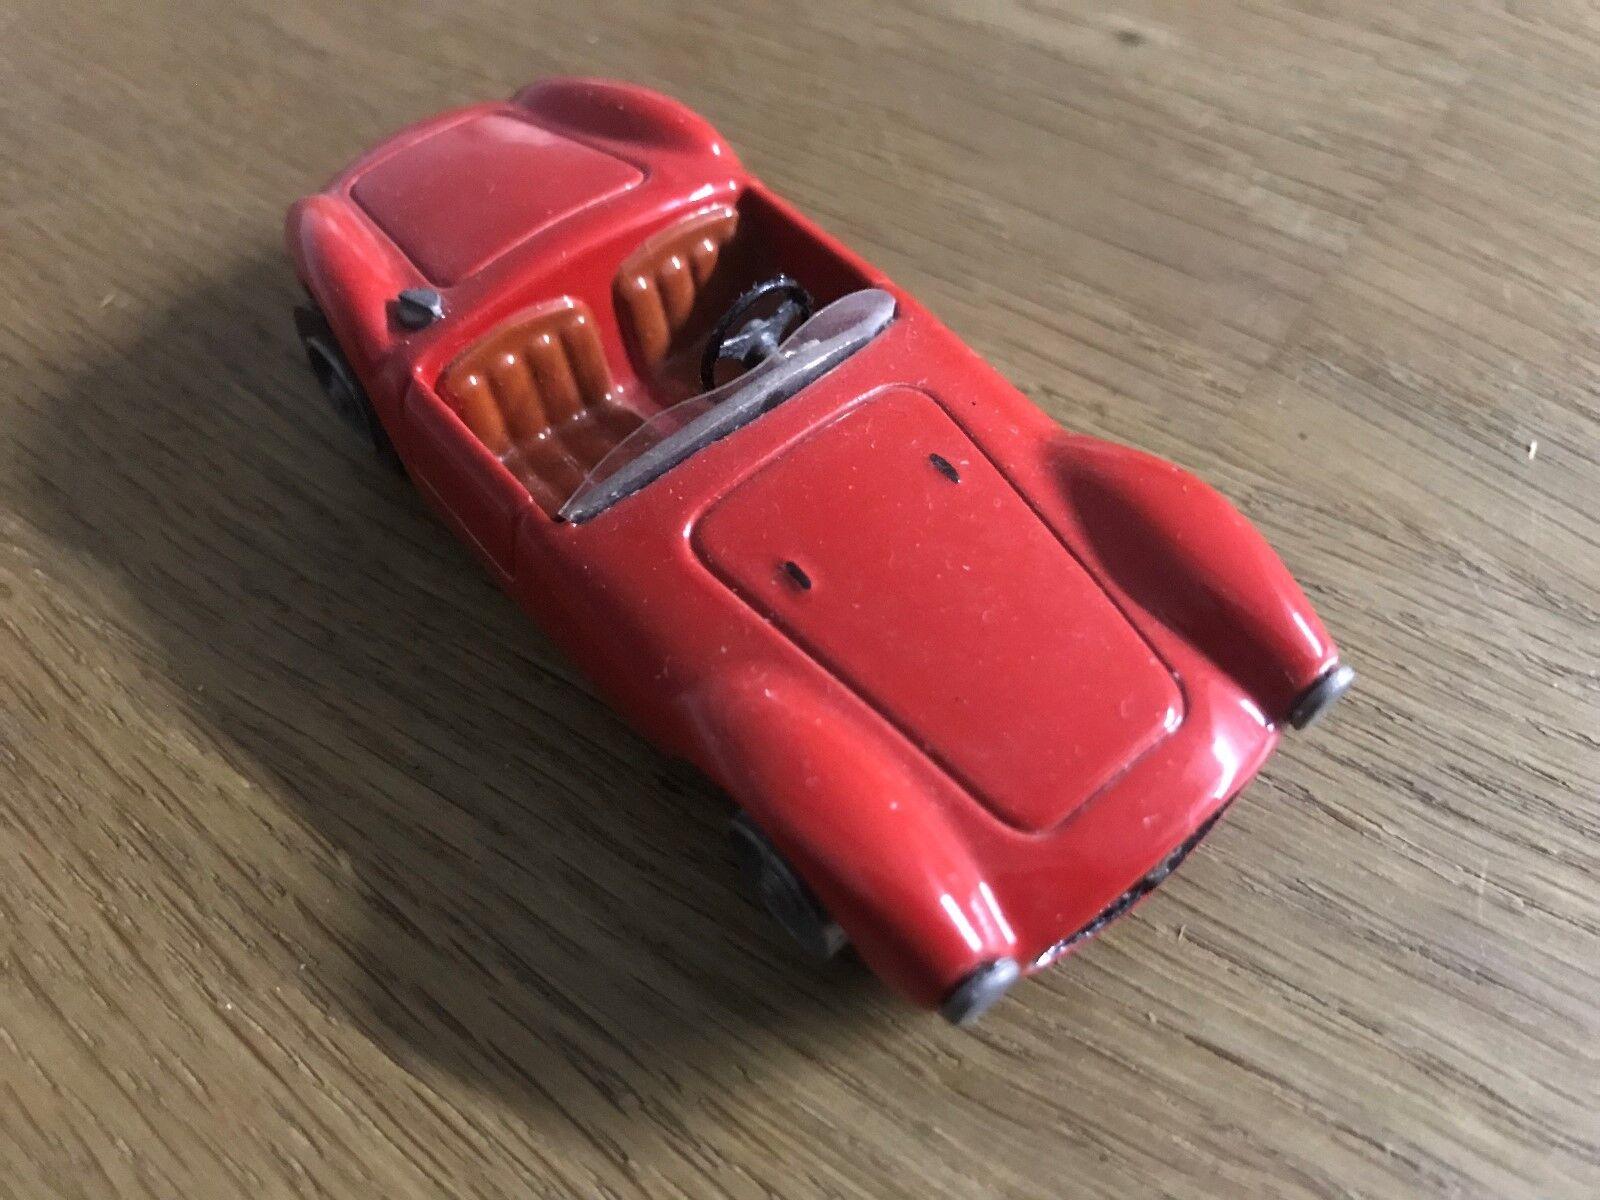 Maserati Modellauto Replicas Handarbeit 200Si 300S 200Si Handarbeit toy modelcar 1 43 d8749f